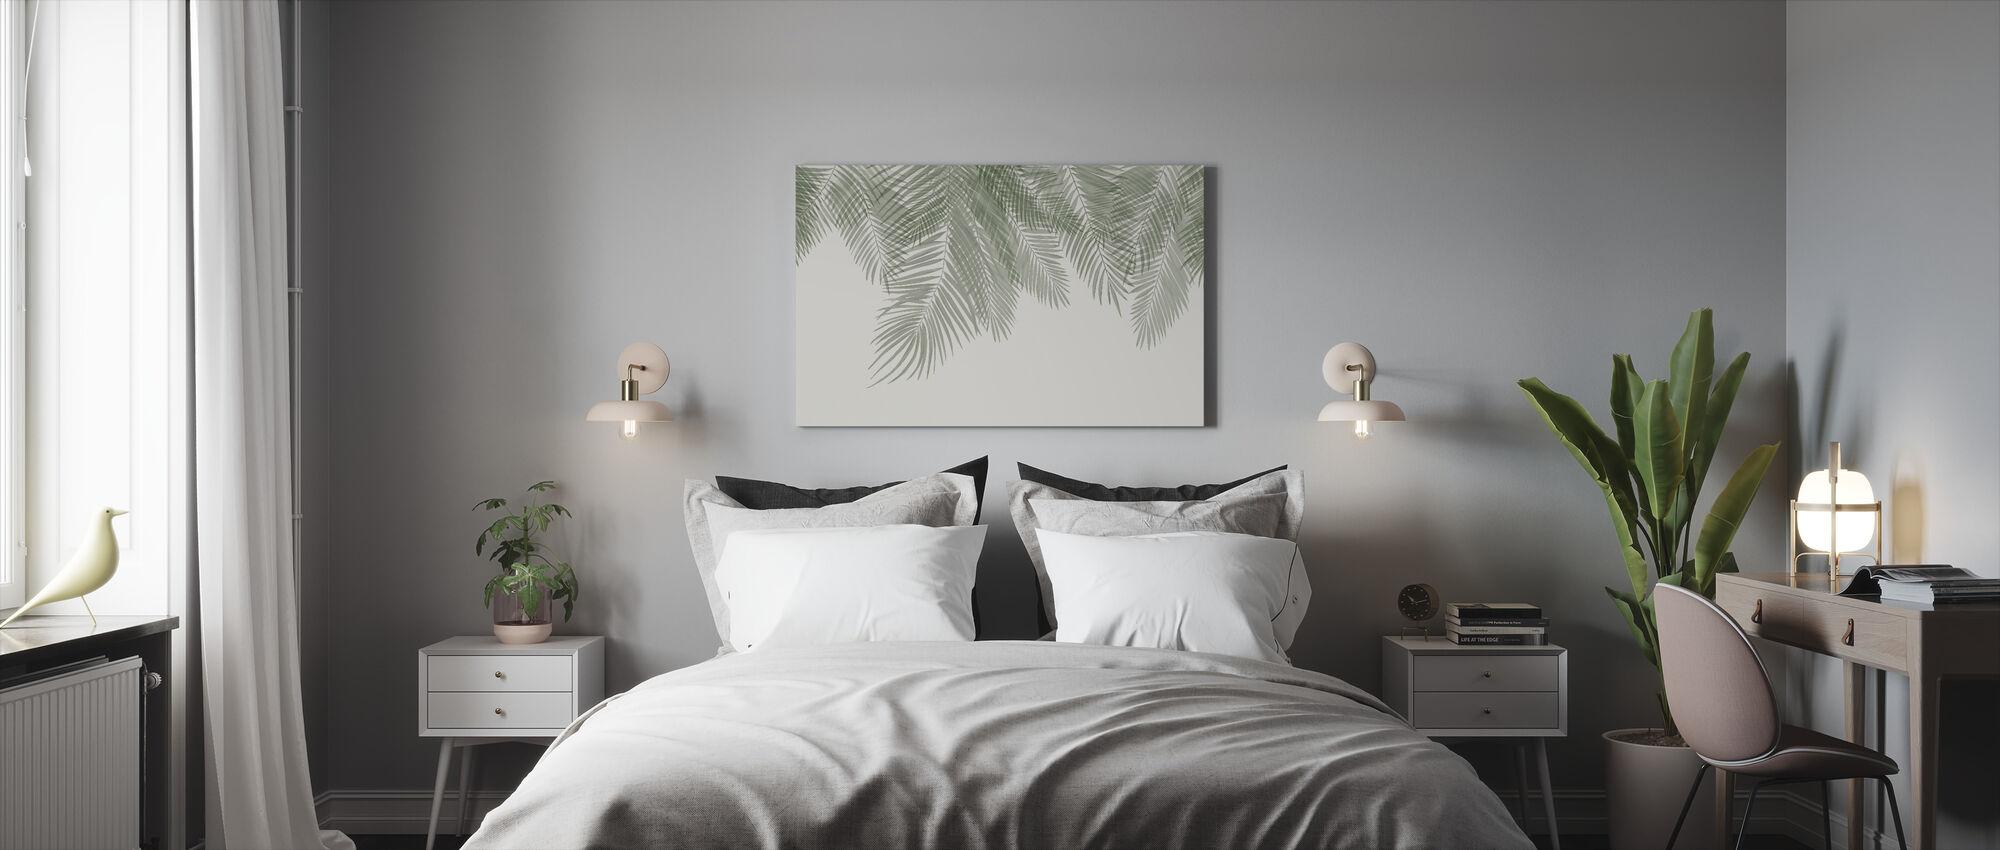 Hanging Palm Leaves - Beige-Green - Canvas print - Bedroom